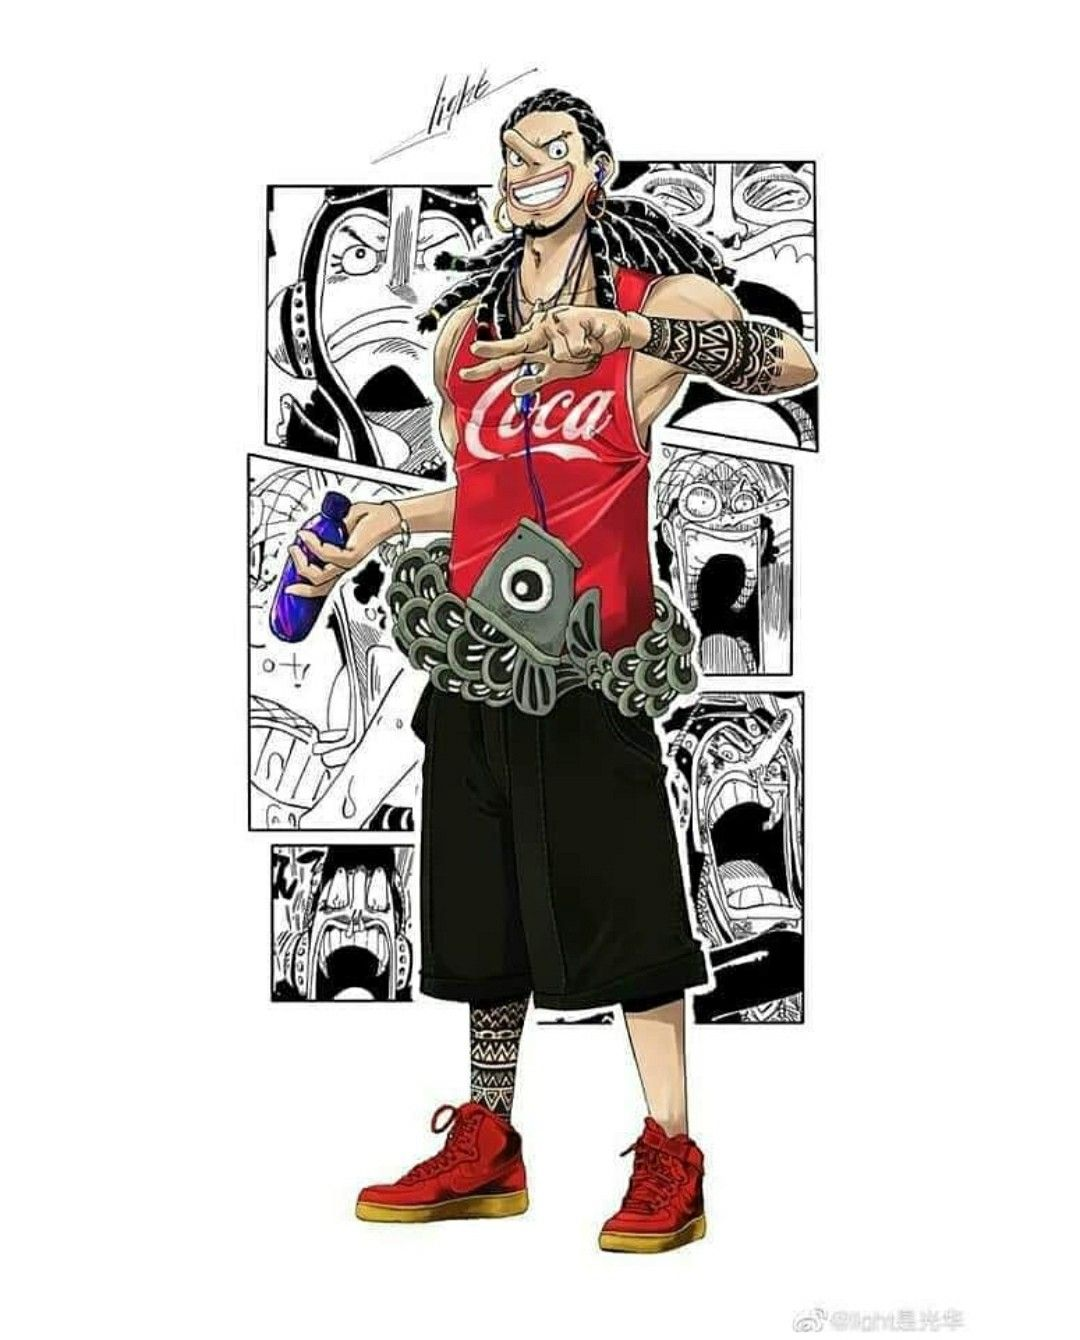 One piece anime image by Izmi Mirai on SHP & family in